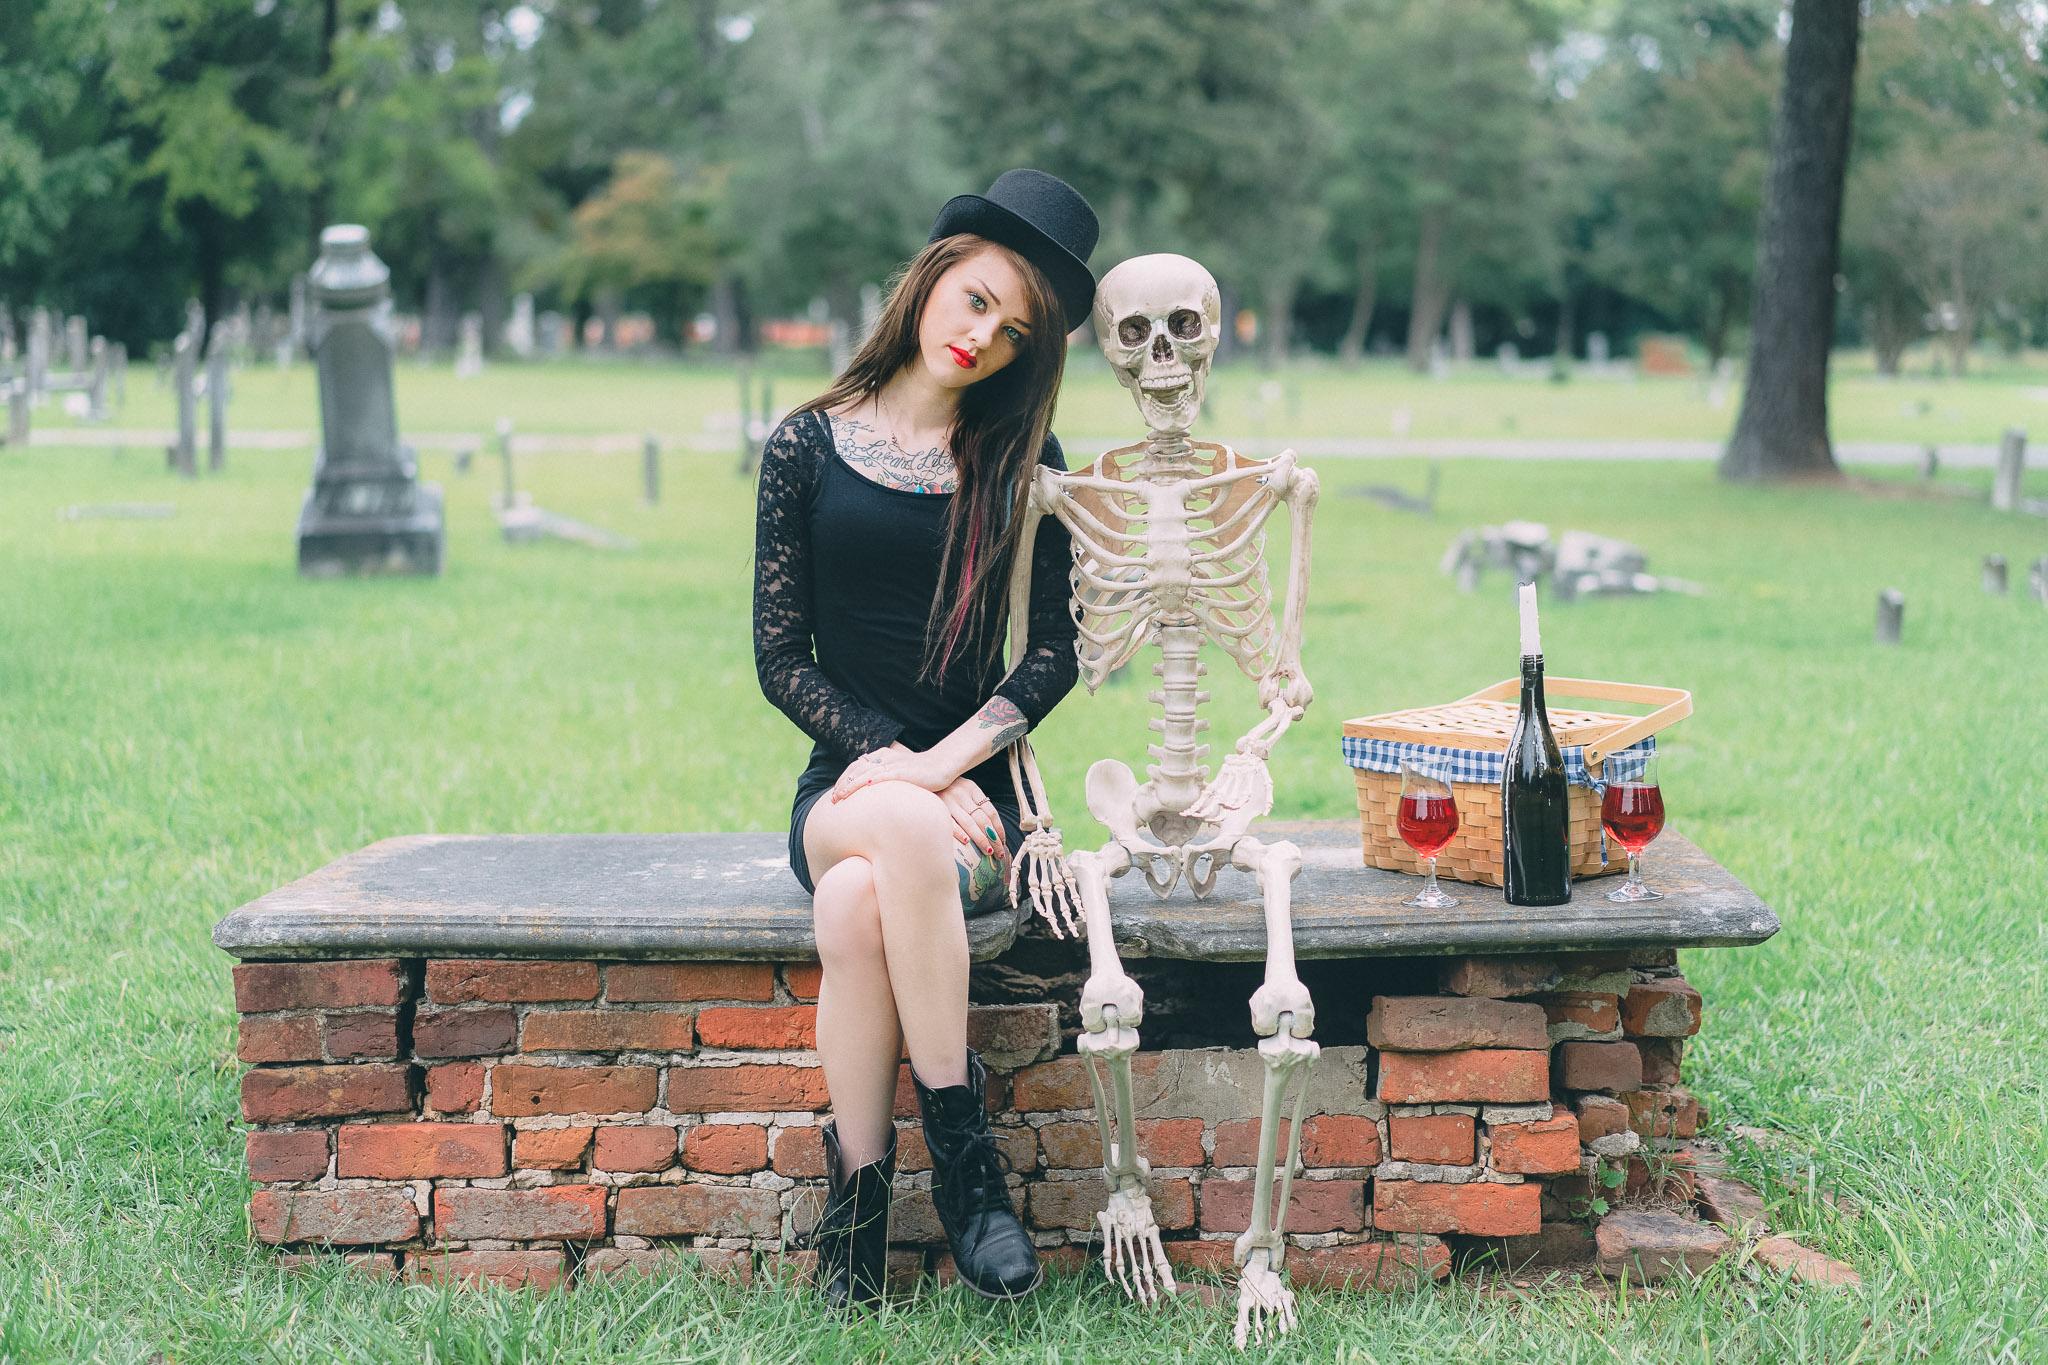 Model: Mykayla Mckenzie  Model: Bob The Skeleton  Cameras used: Sony A7  Lens:Sonnar T* FE 55mm F1.8 Z